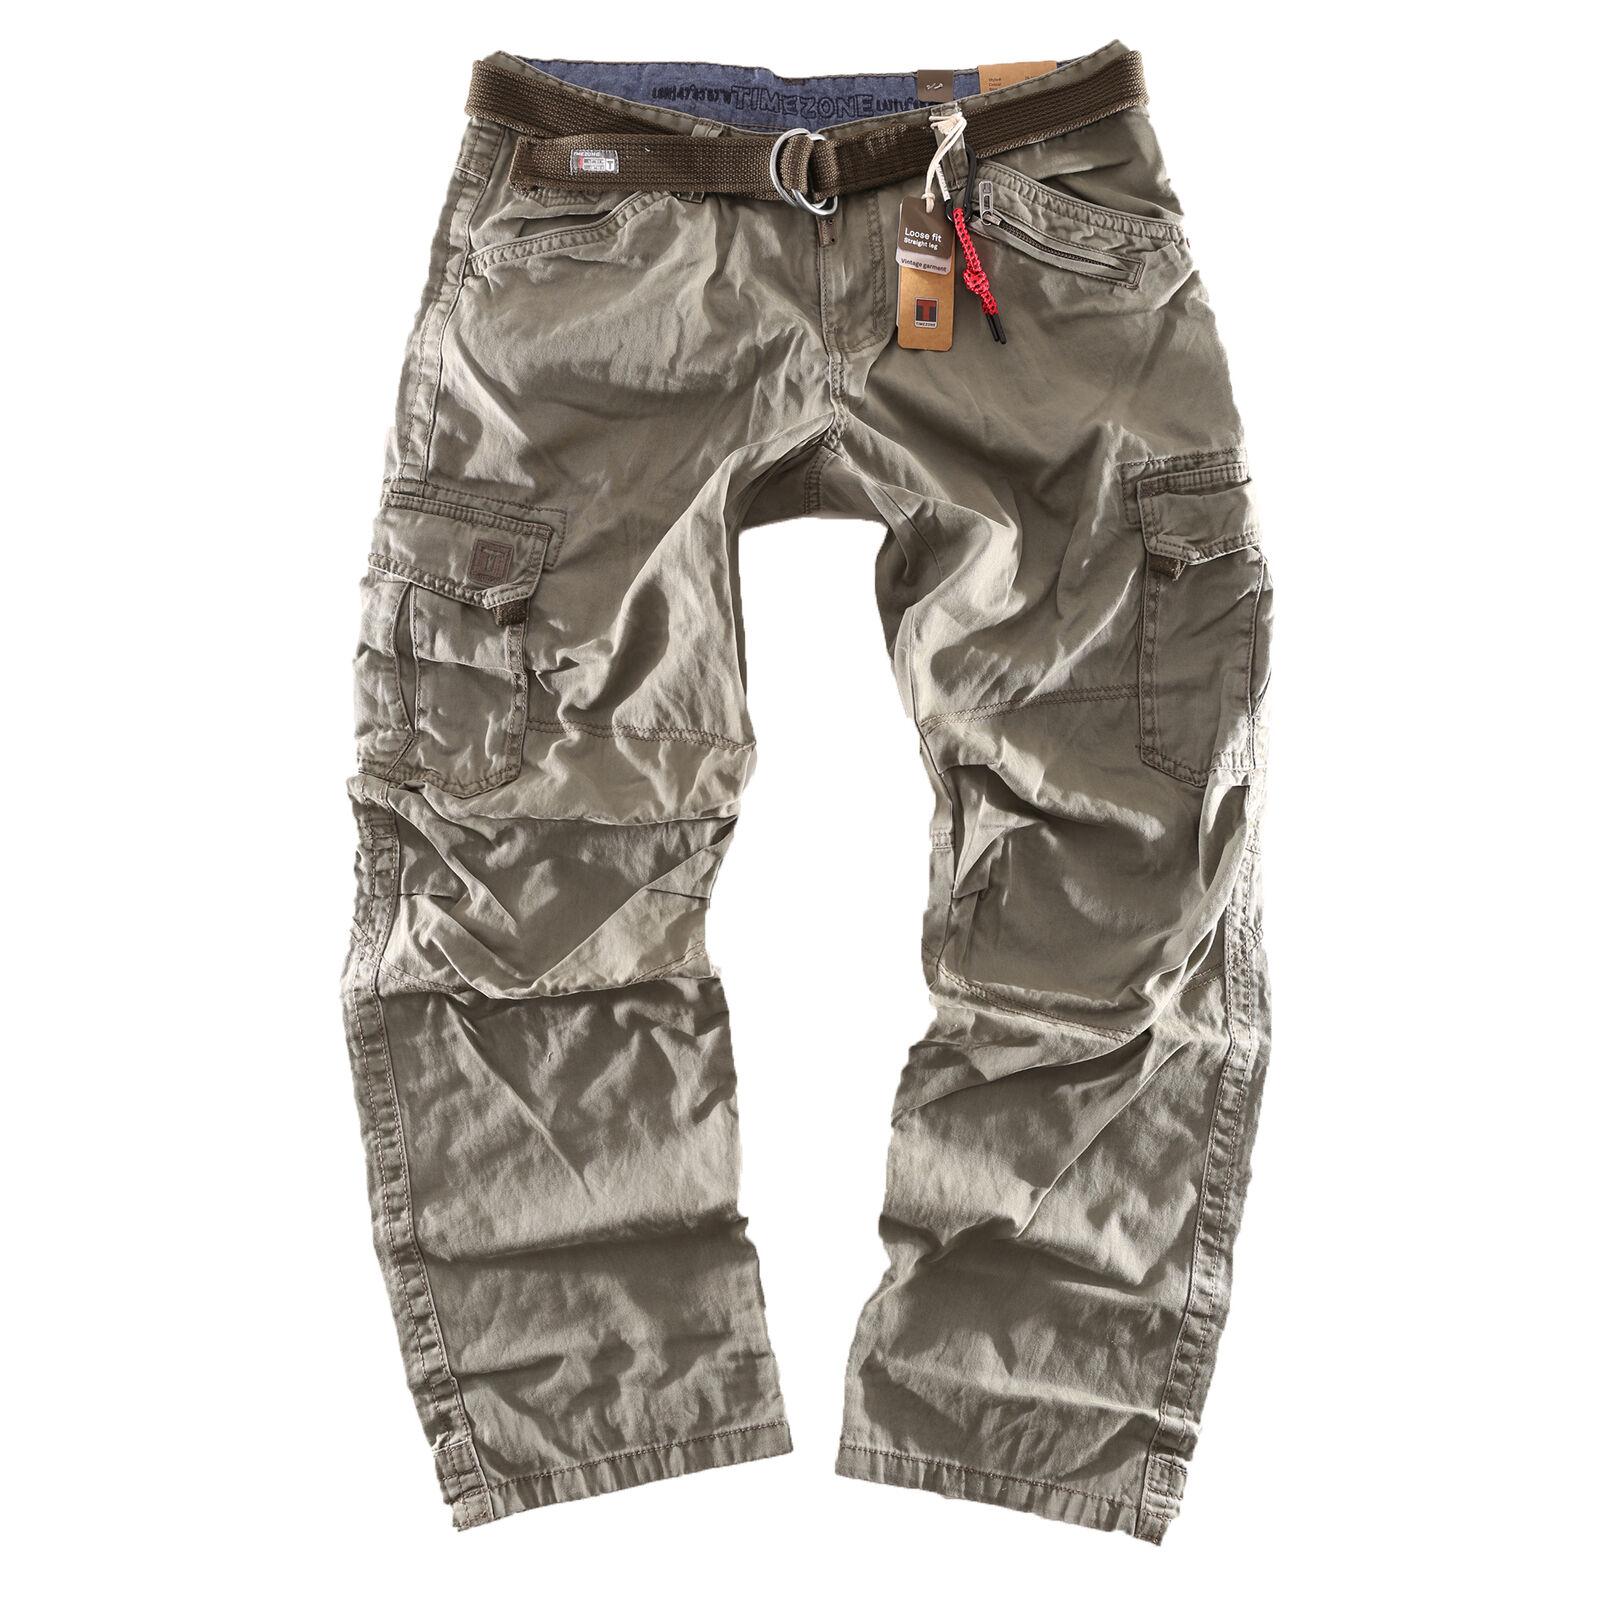 Timezone Herren Worker Jeans Cargo Cargo Cargo Hose Benito TZ 4019 ivy olive NEW 2019 c88c8d